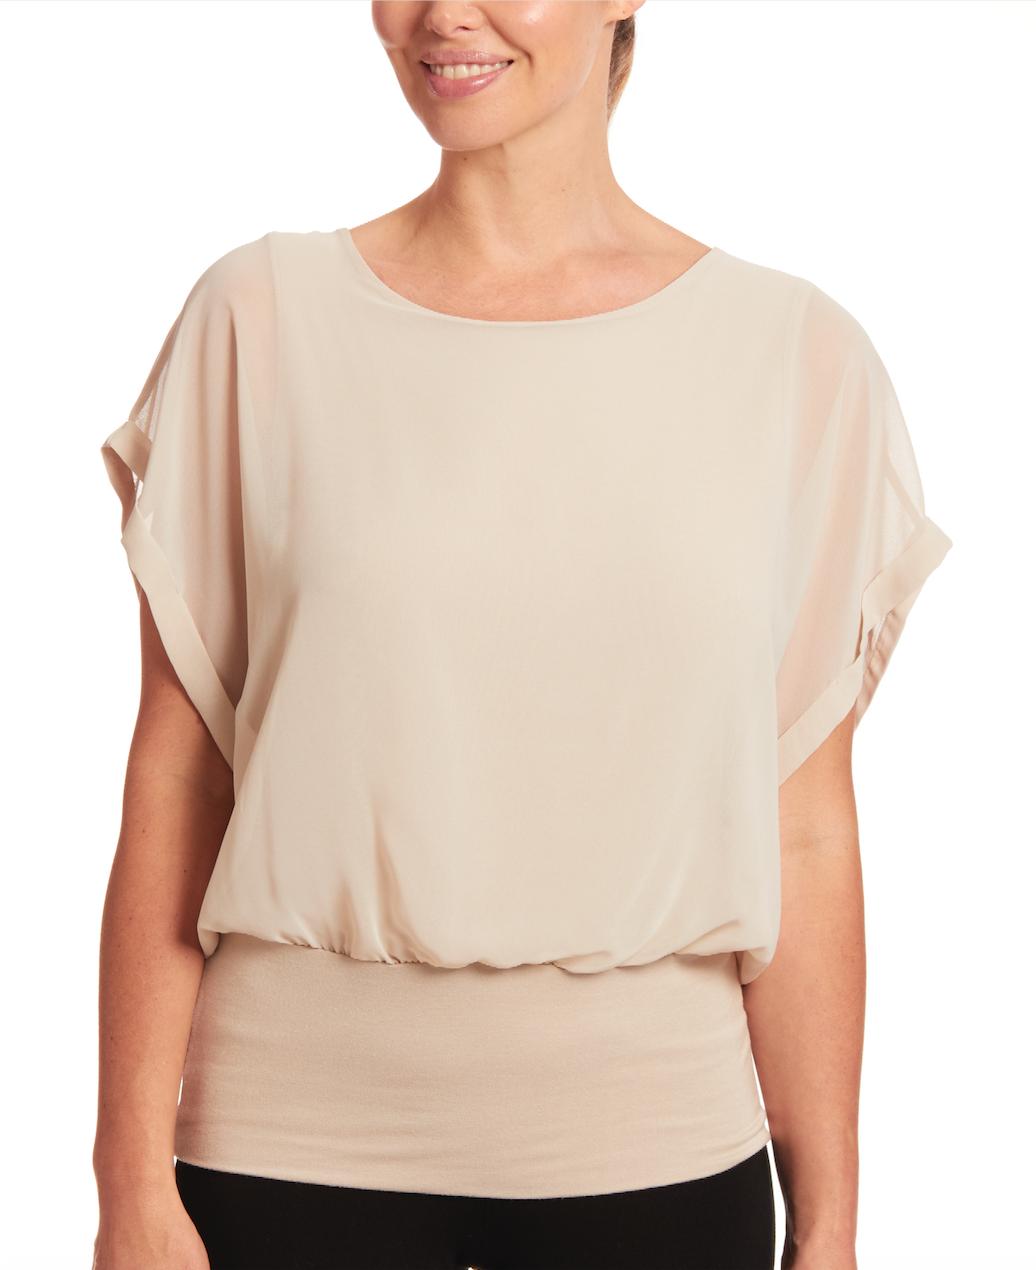 Dolman Short Sleeve Blouse in New Khaki